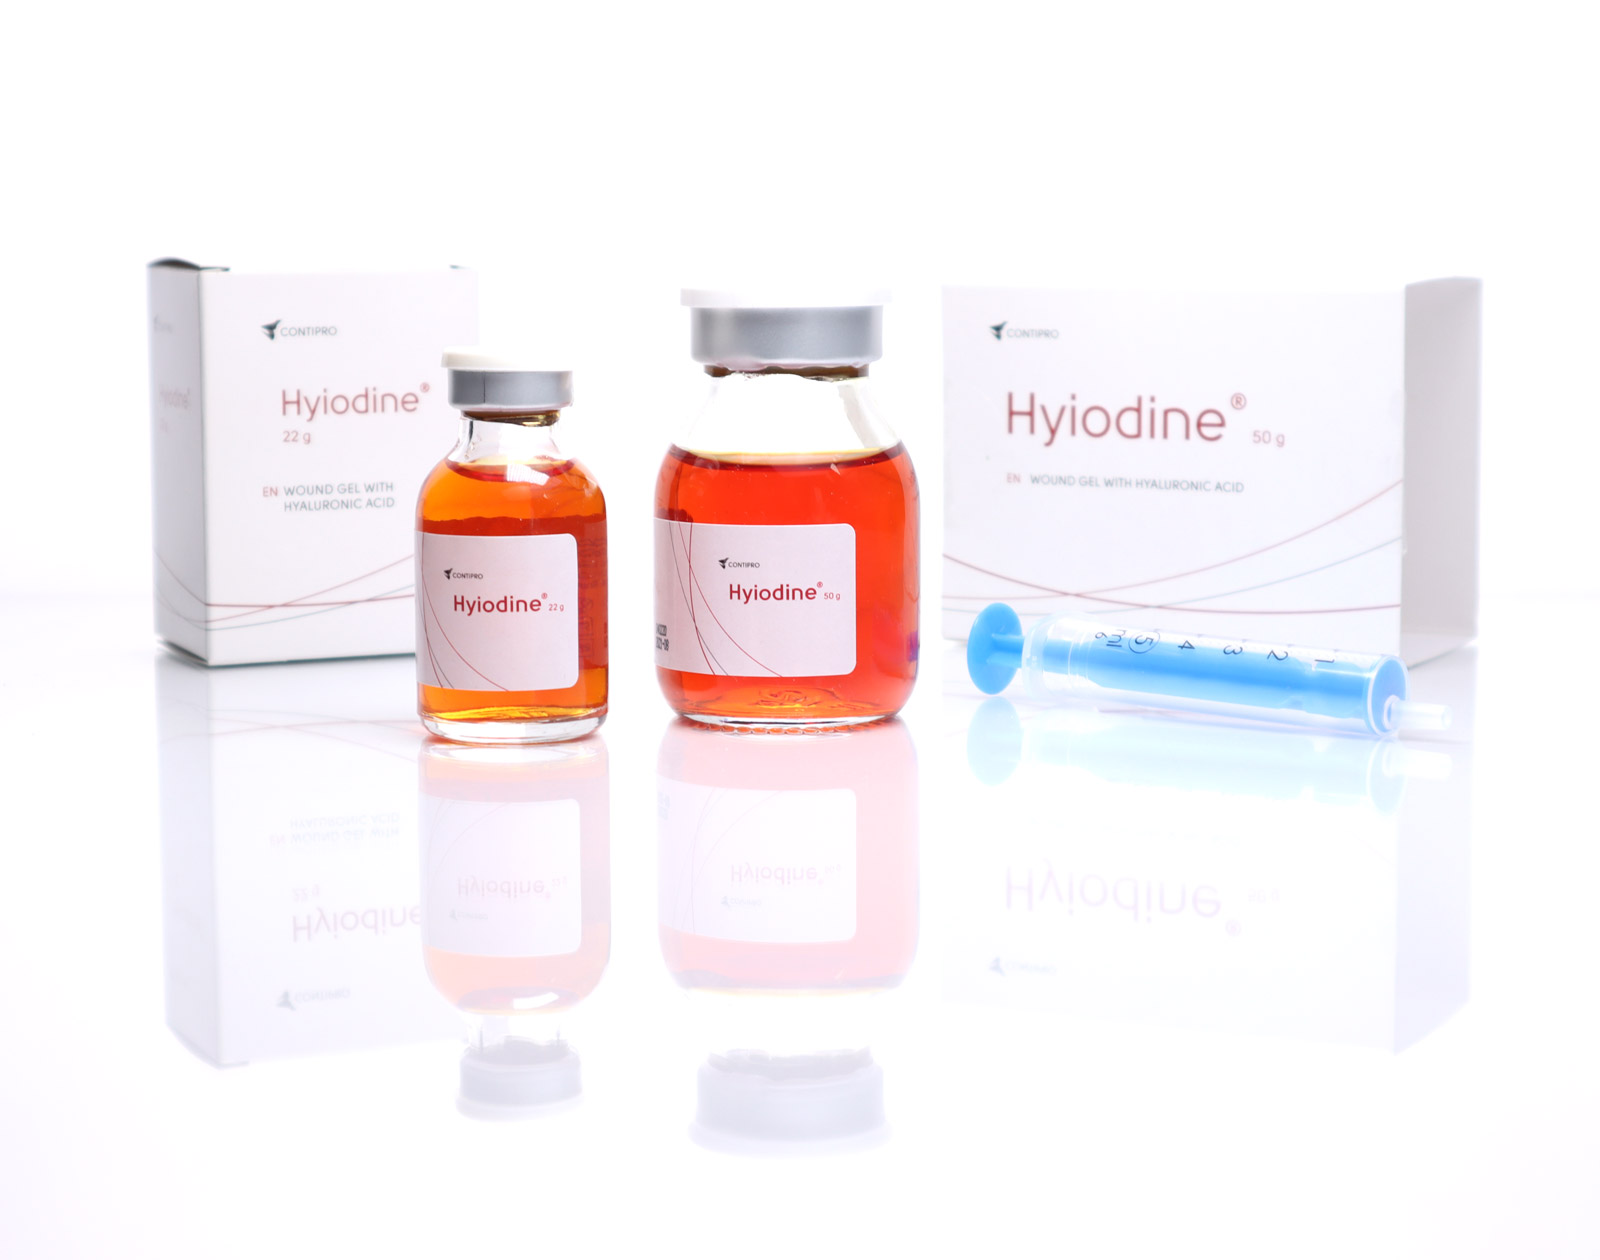 Hyiodine